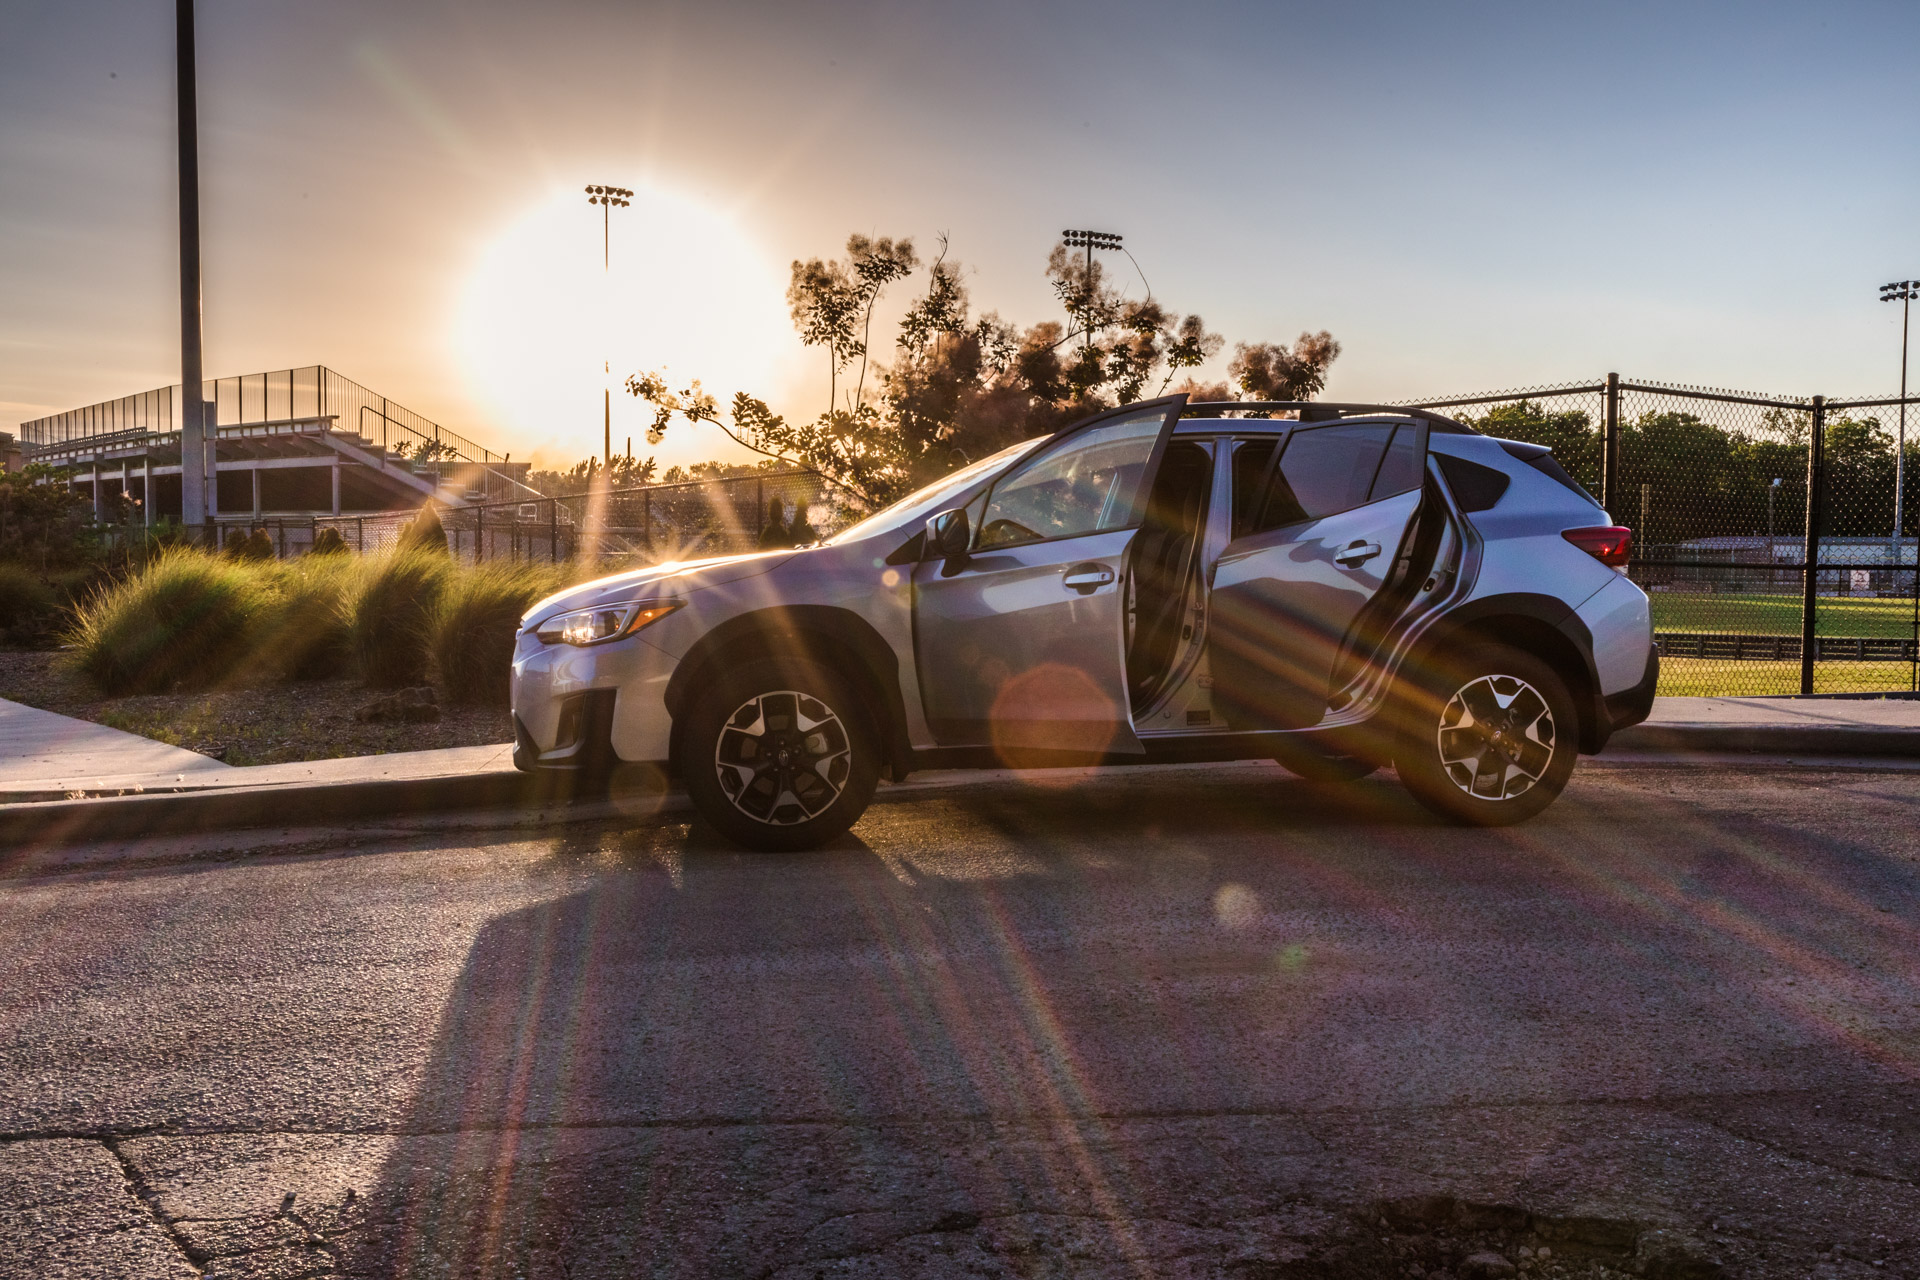 Fletcher Subaru Commercial Photography